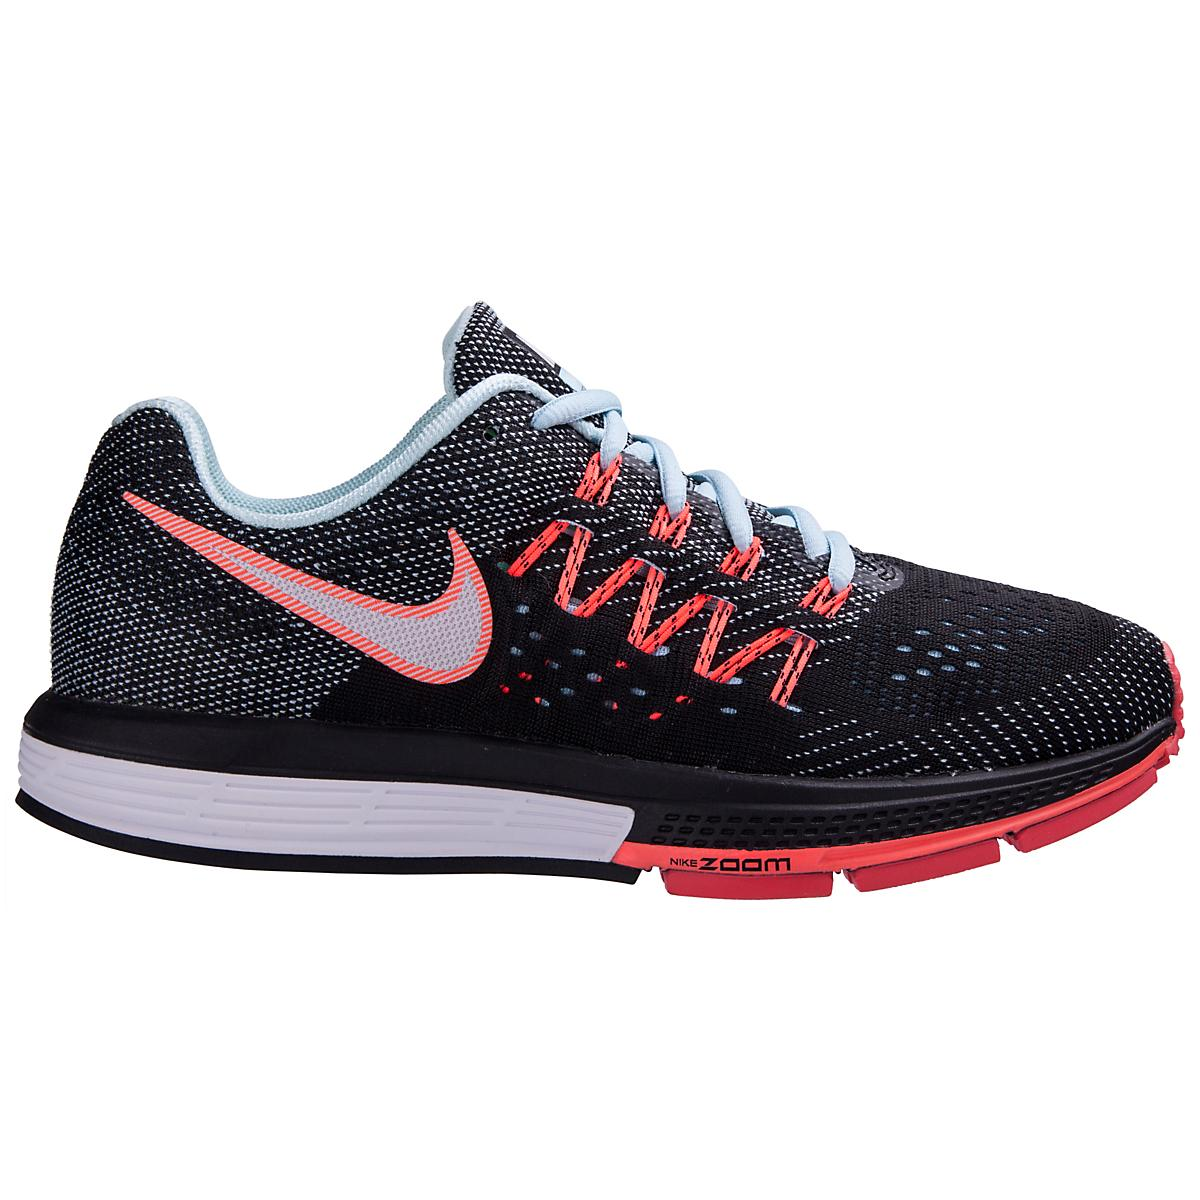 f01f817533495 Womens Nike Air Zoom Vomero 10 Running Shoe at Road Runner Sports